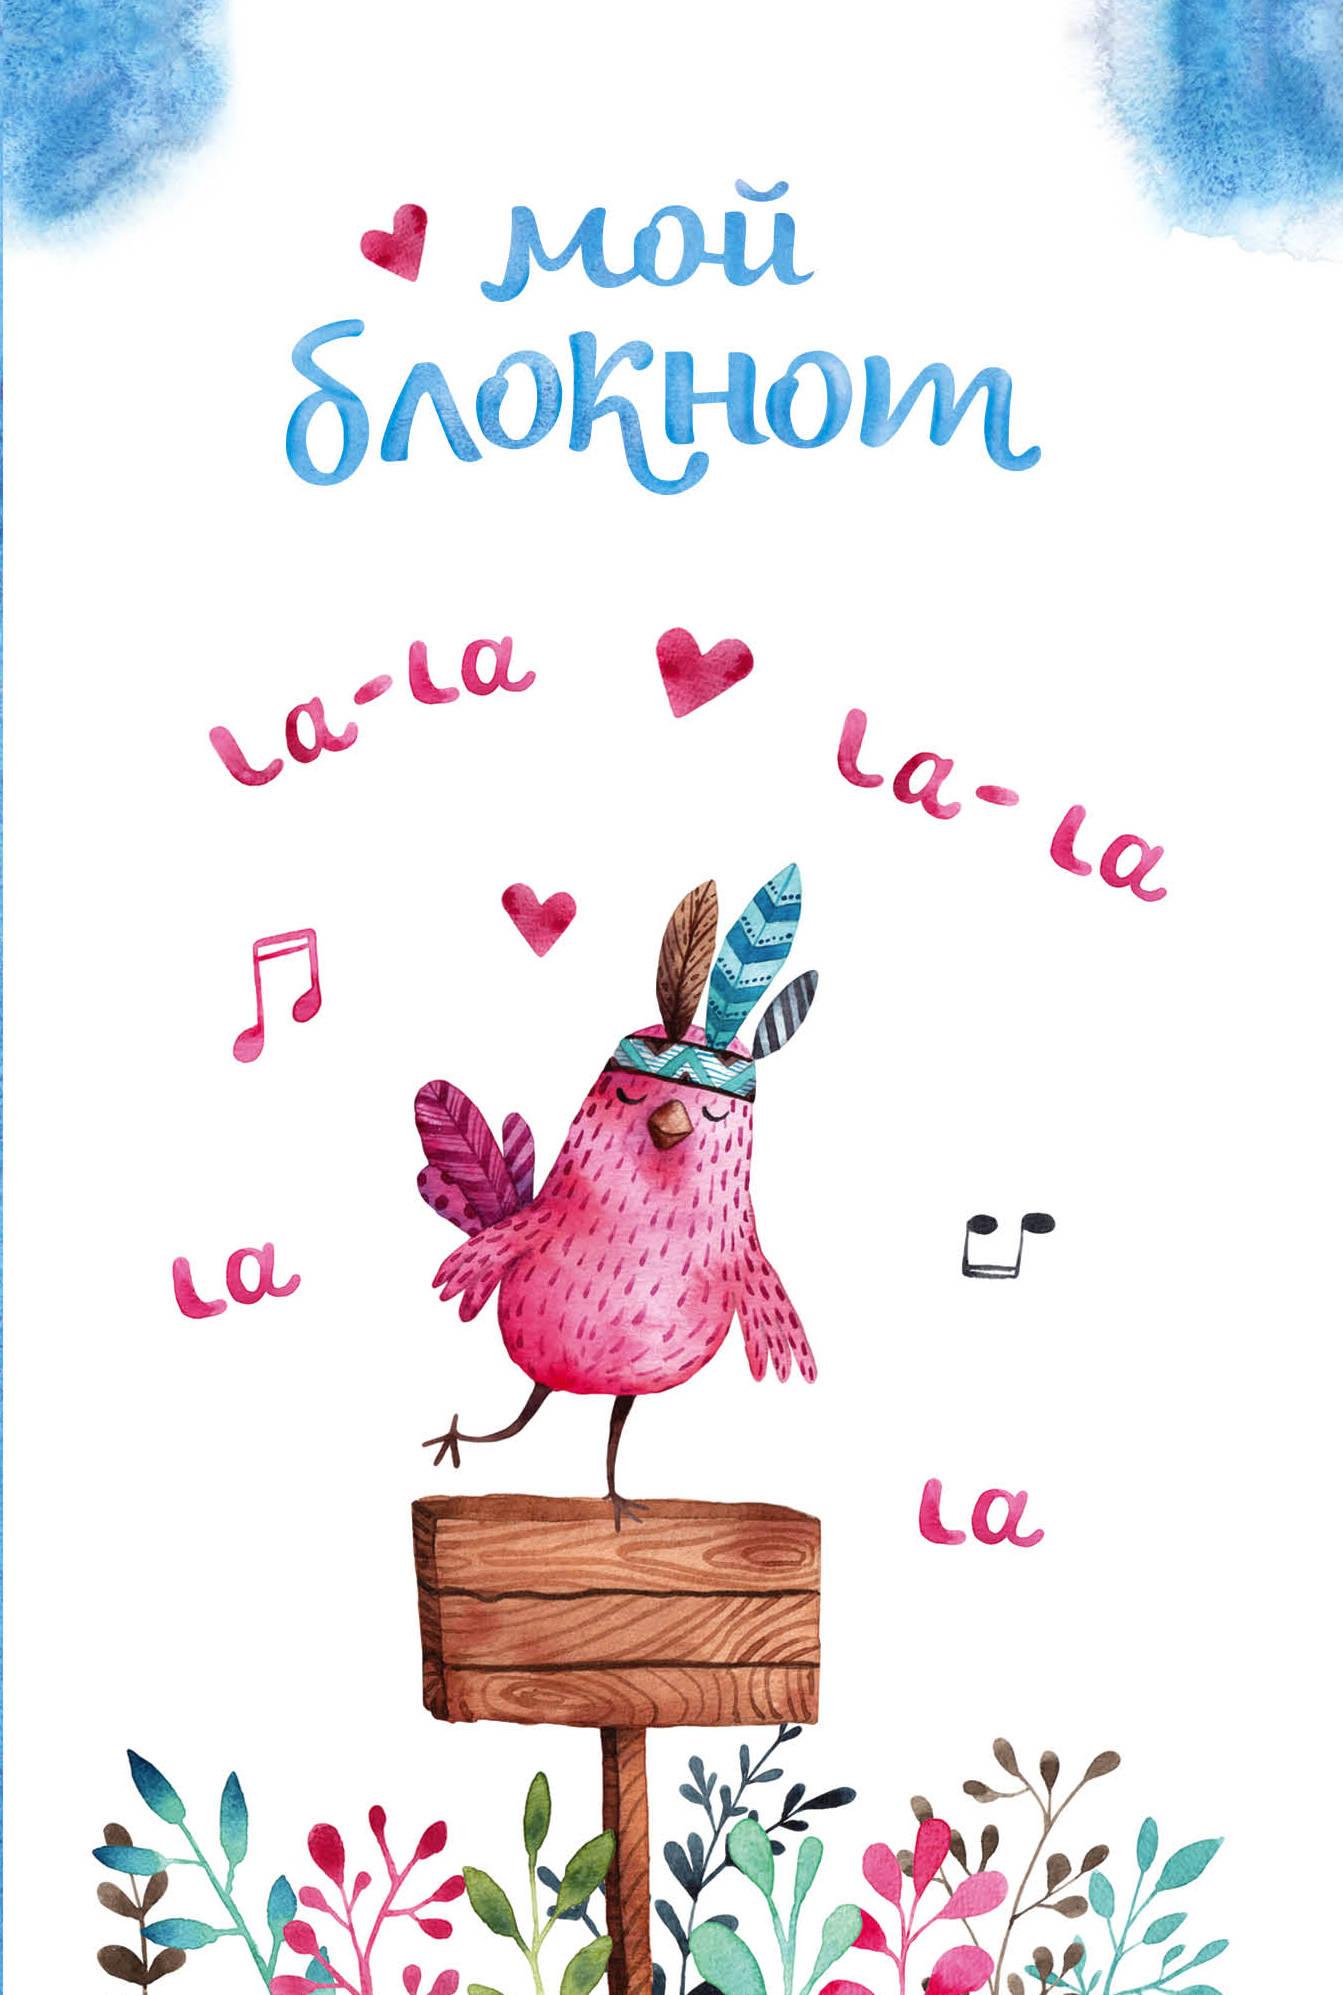 Мой блокнот. Певчие птички от @mashamashastu (голубой) м а ступак певчие птички от mashamashastu мой блокнот зеленый